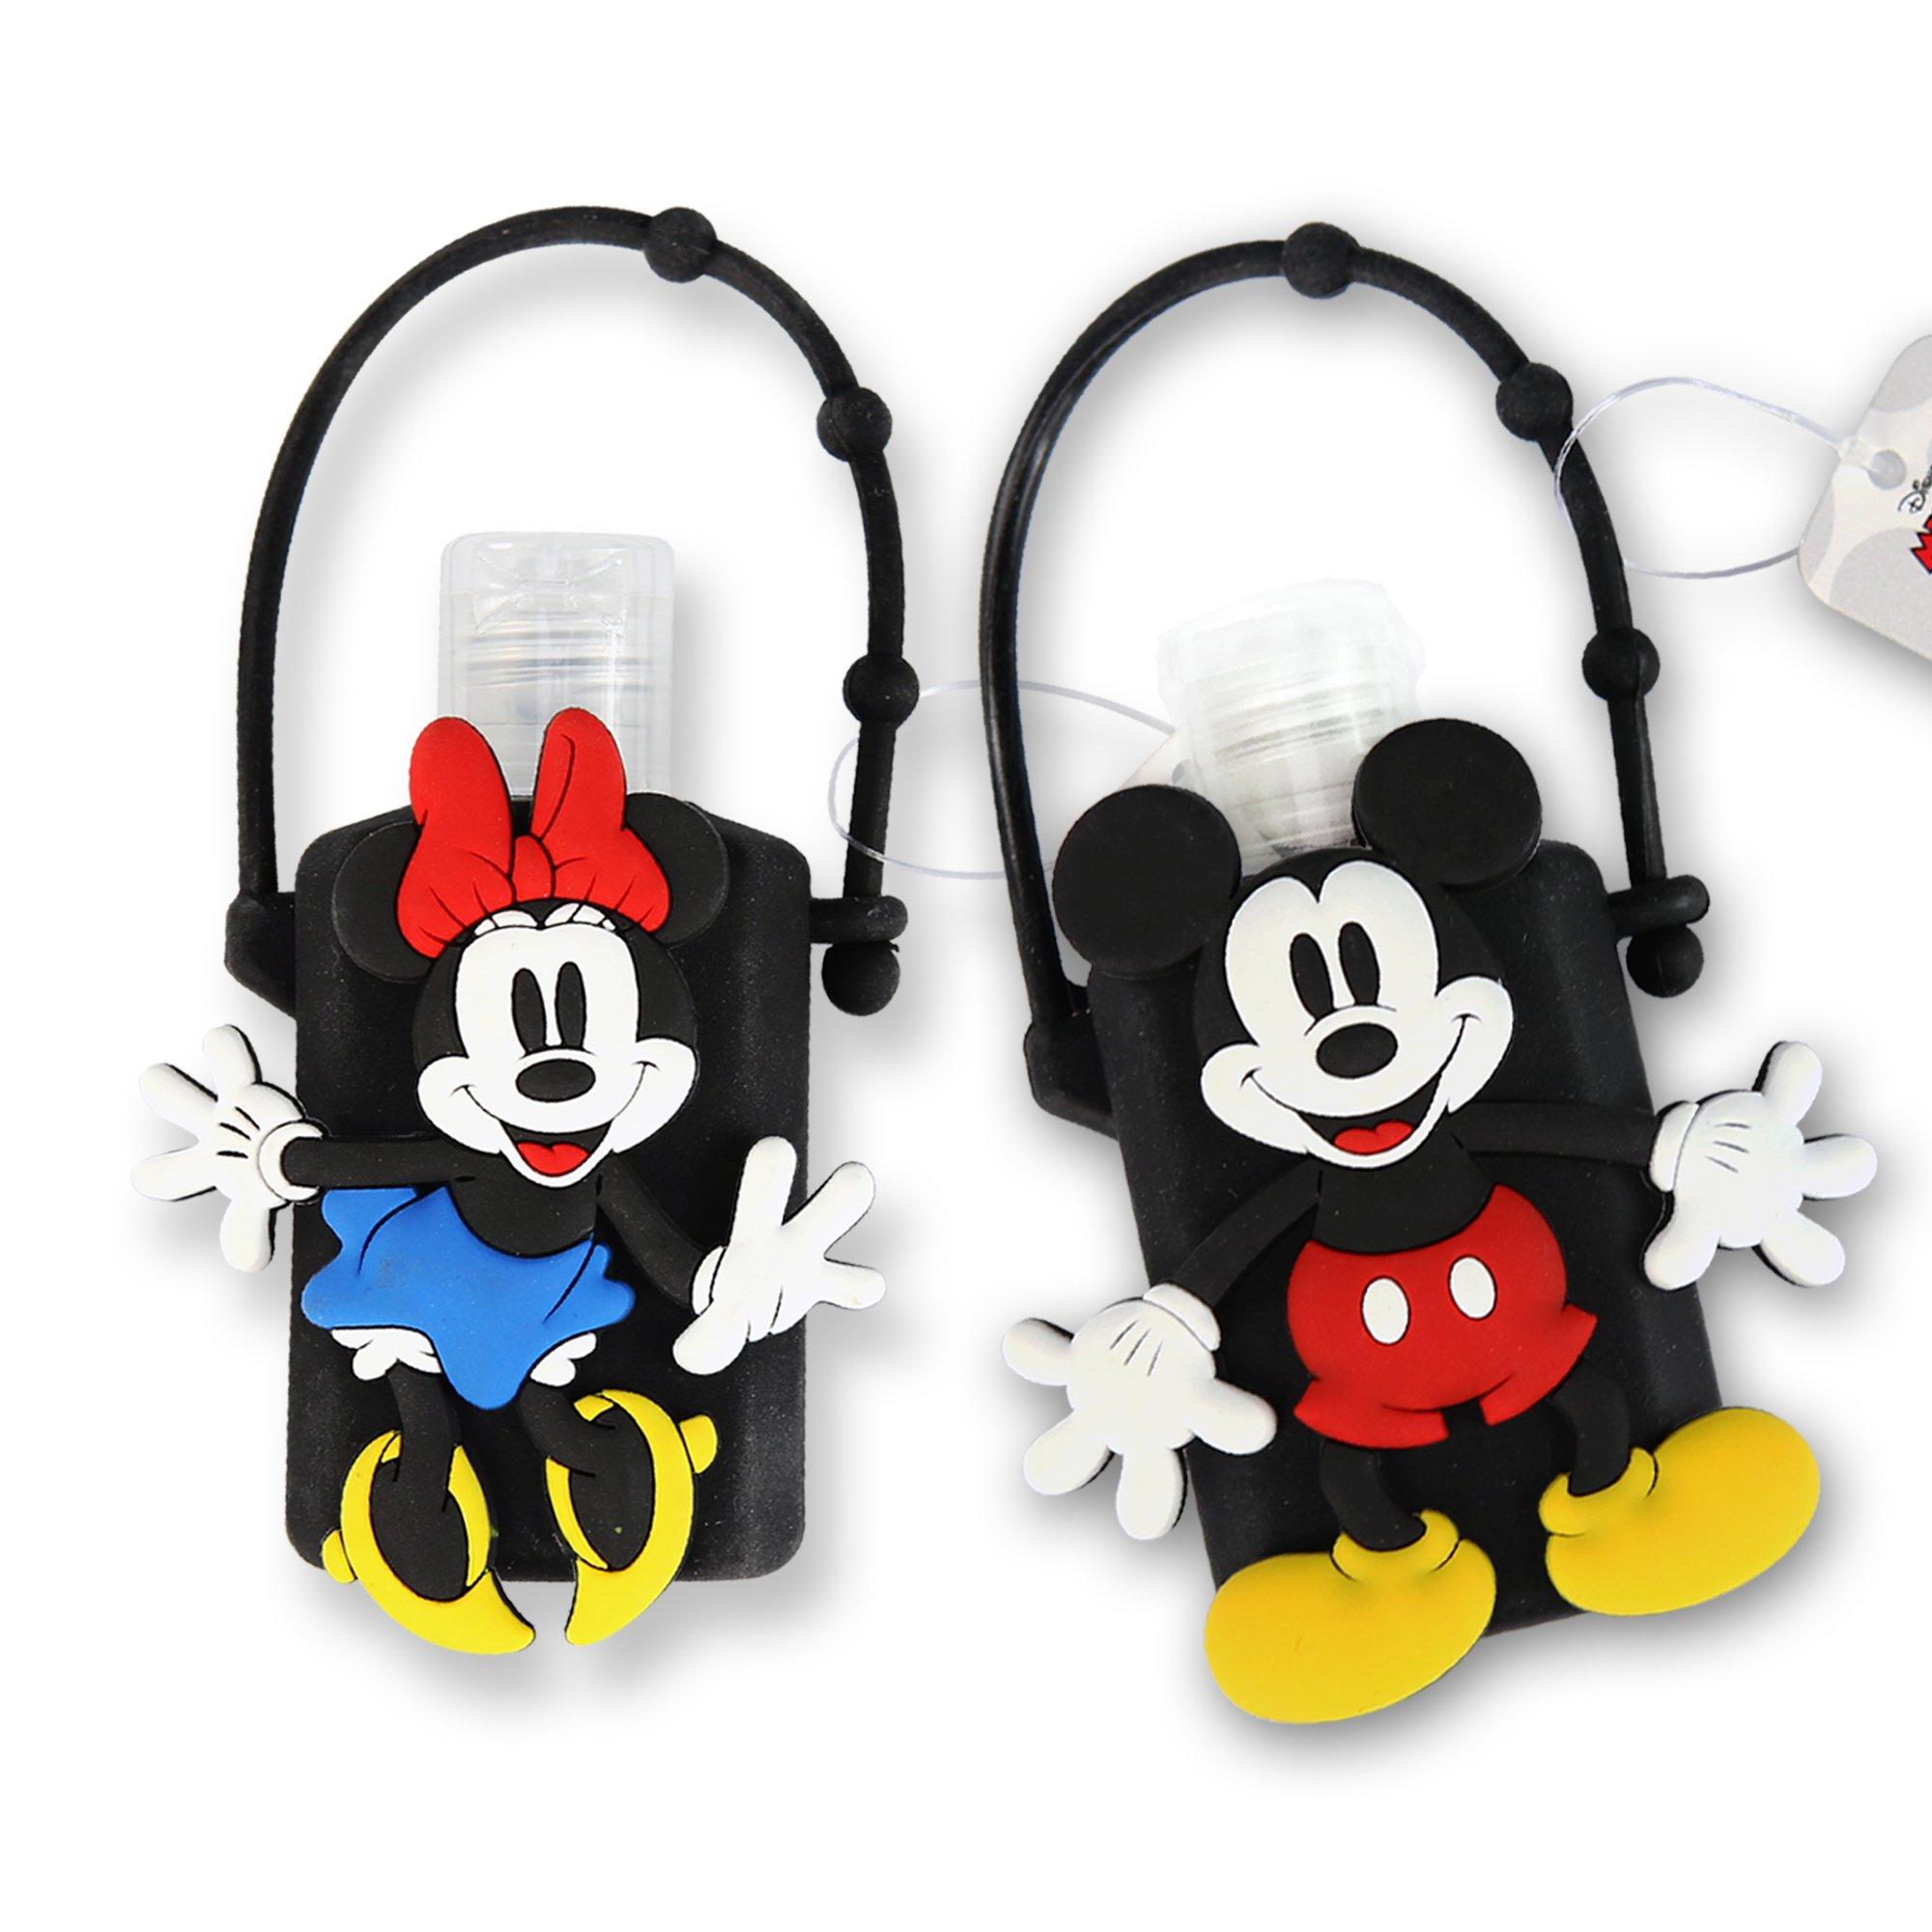 Amazon.com : DISNEY Portable Hand Sanitizer with Holder (Mickey ...